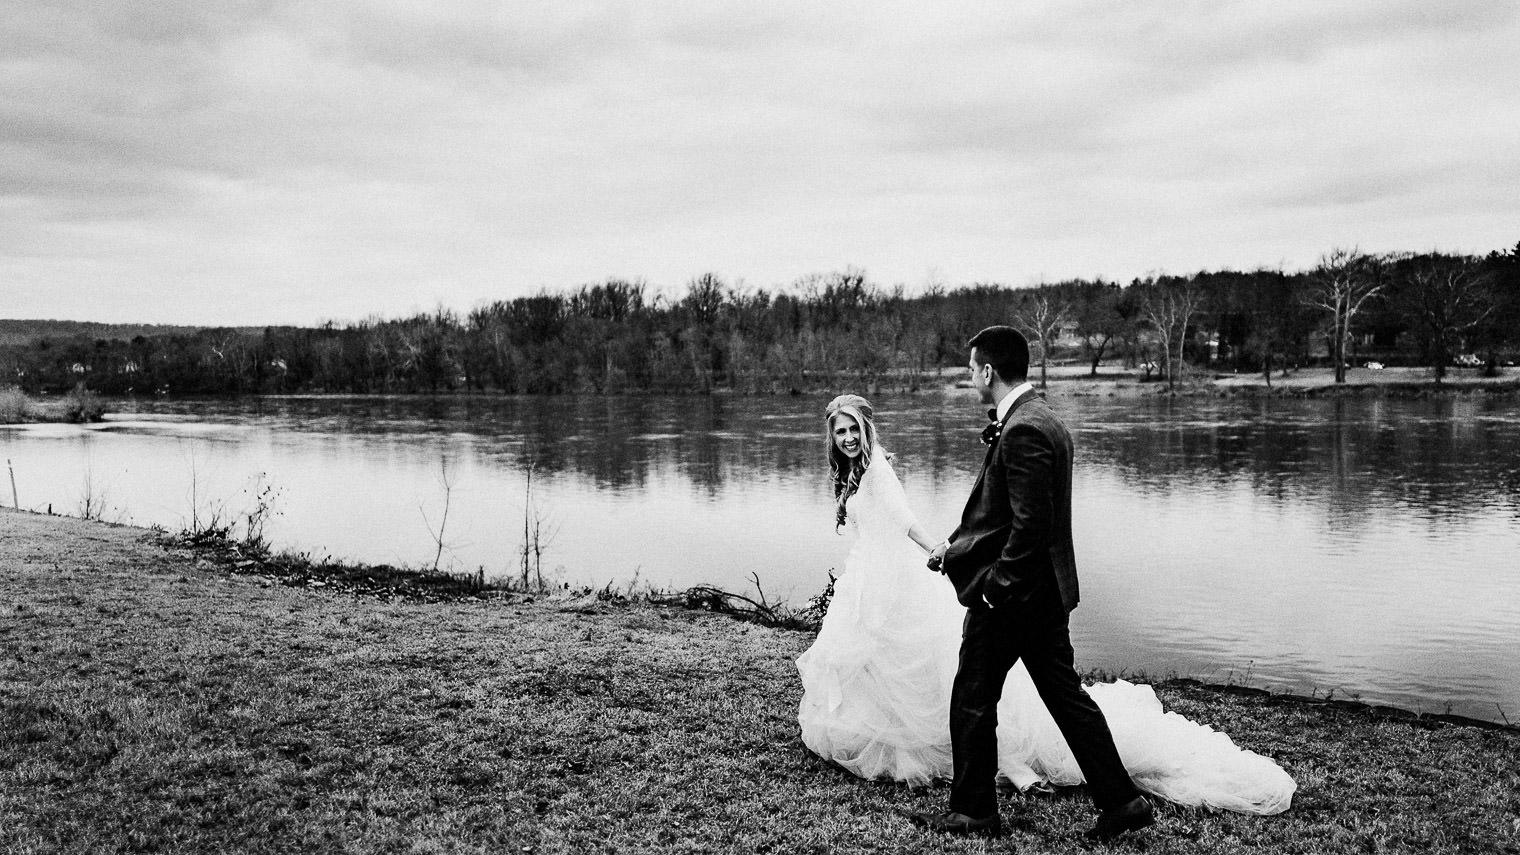 Jay-Cassario-Leica-Wedding-17.jpg